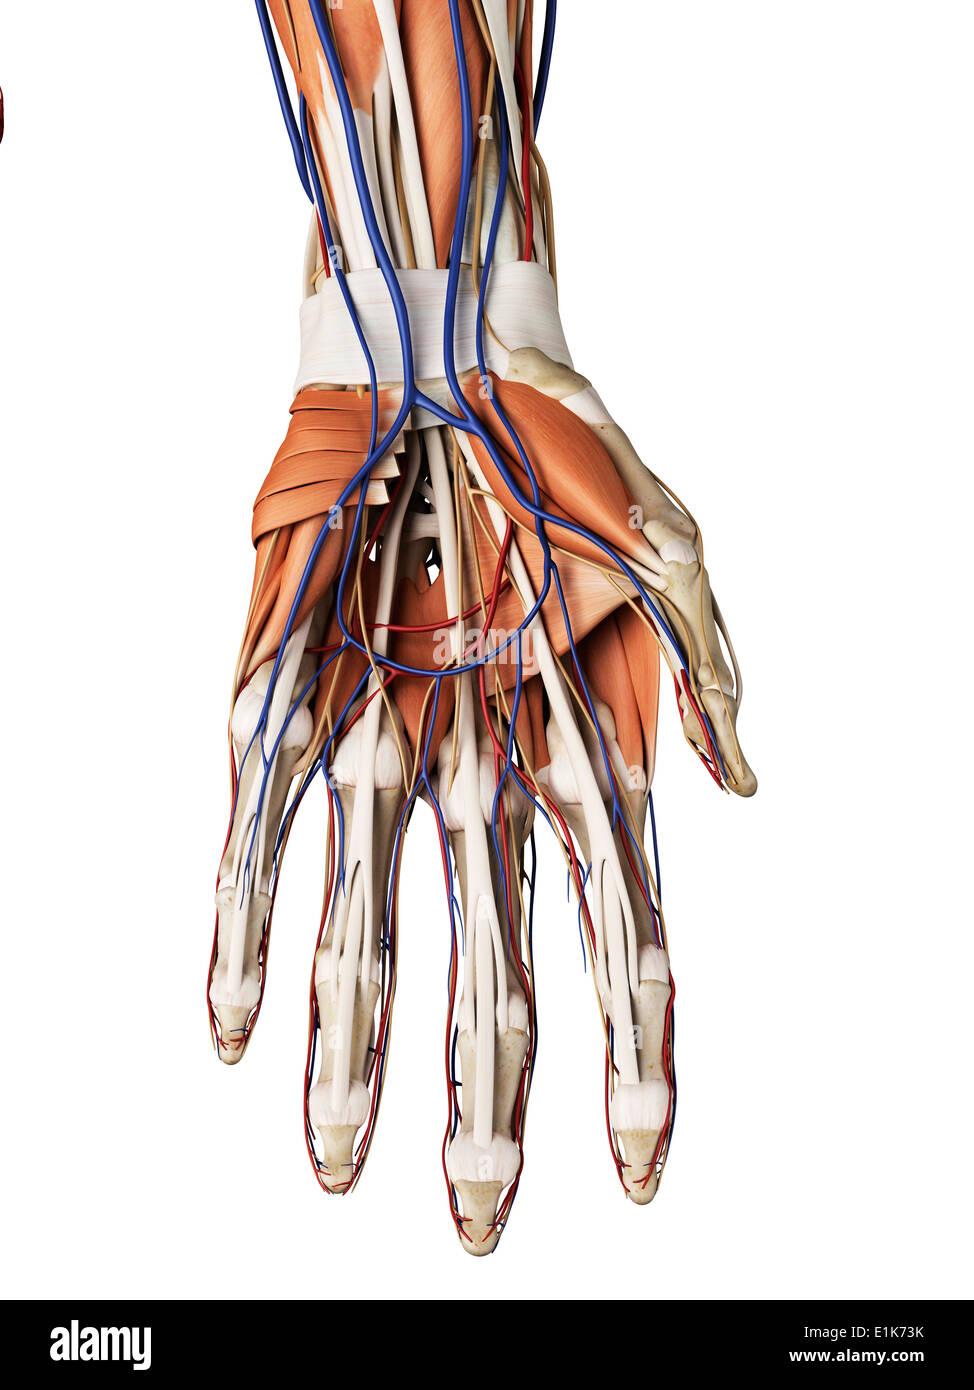 Hand Veins And Arteries Stock Photos & Hand Veins And Arteries Stock ...